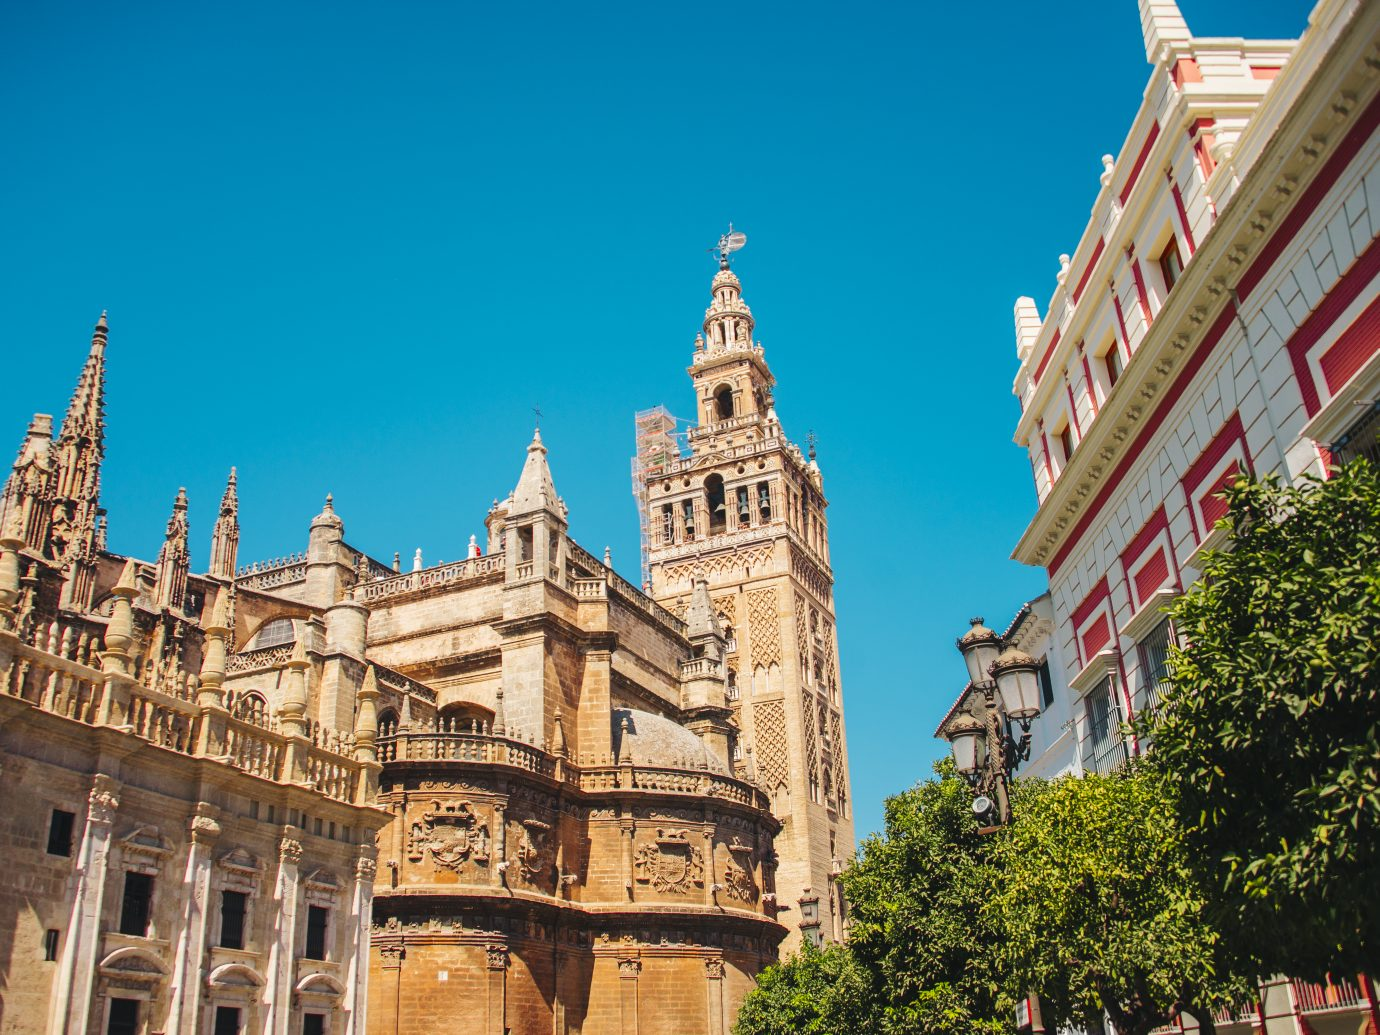 La Giralda tower in Seville, Spain.